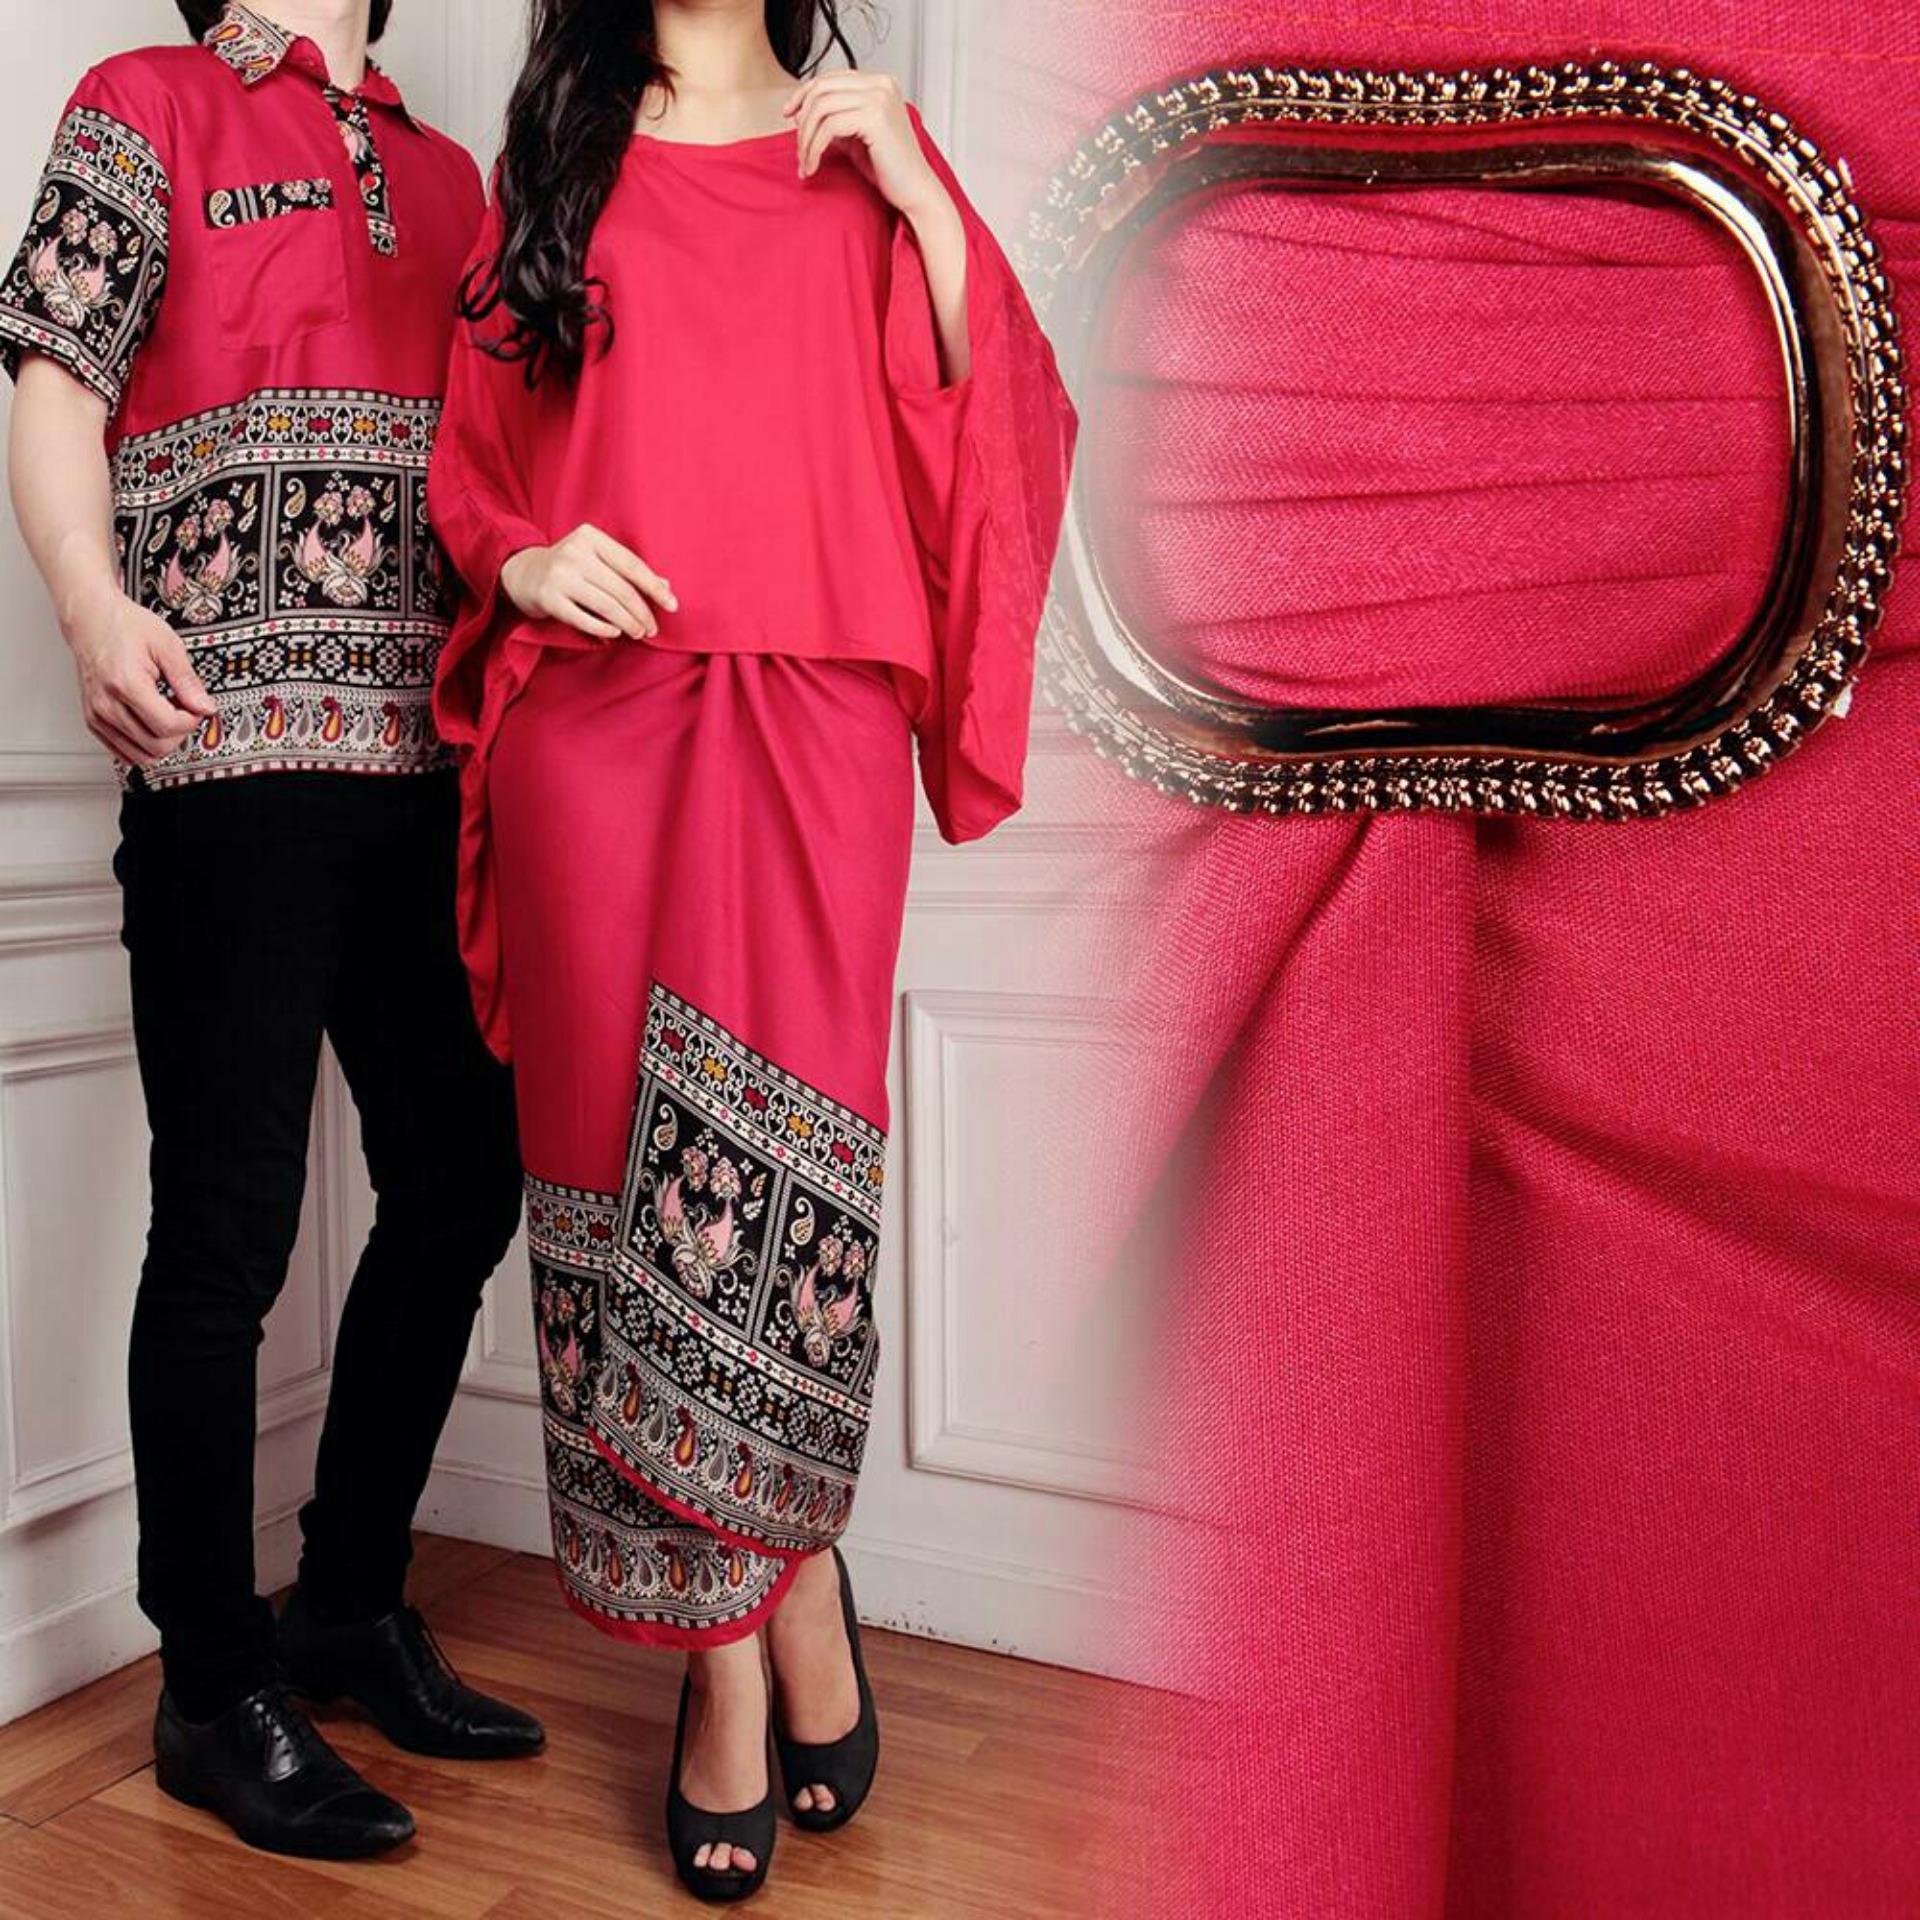 LF Couple Baju Batik Couple Kebaya Kutu Baru Kemeja Pria Modern (namayalu)  7T - d61692dded